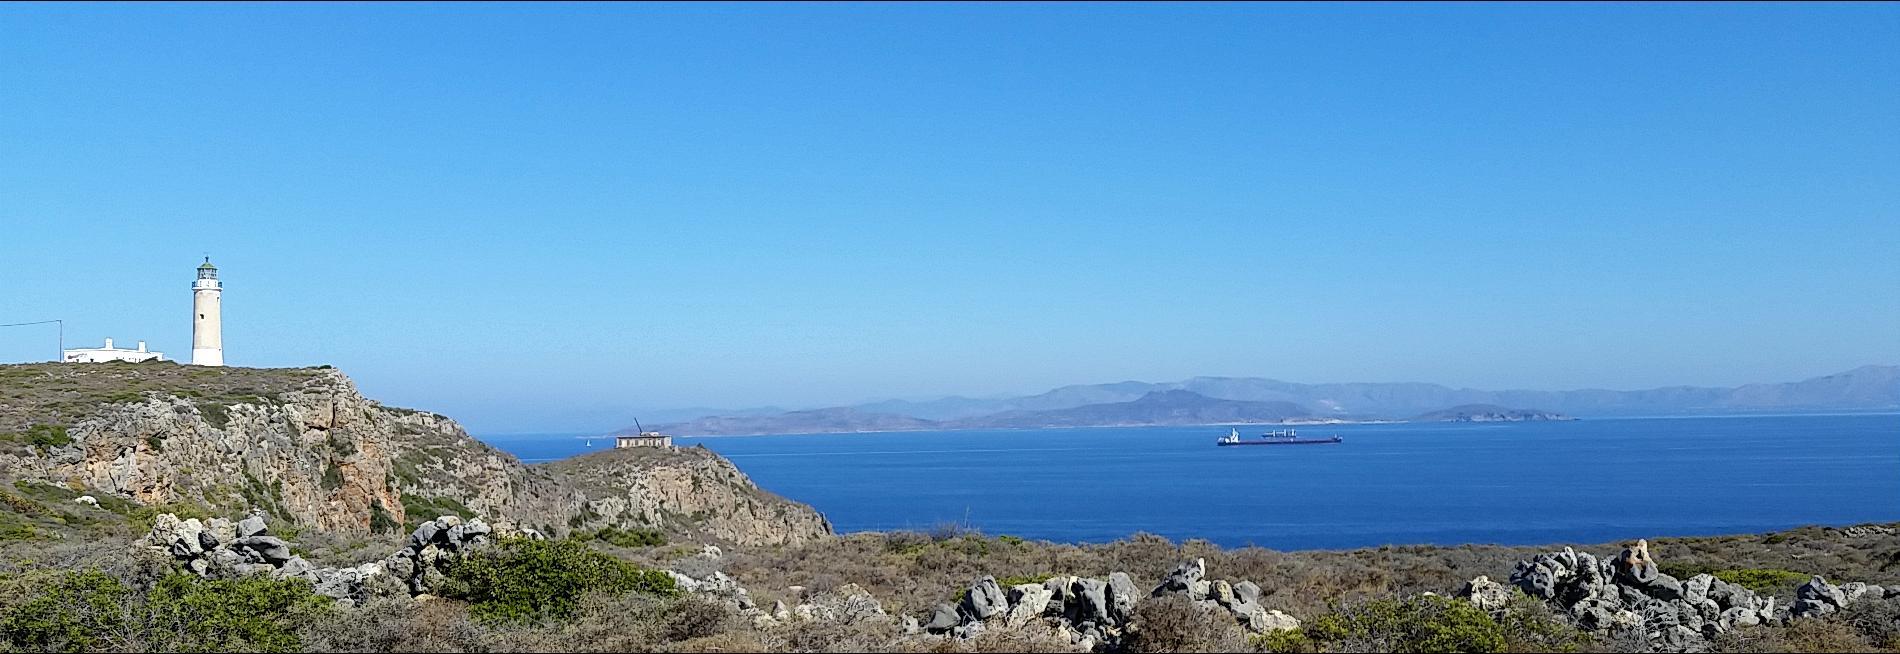 Wanderblog – Insel Kythira